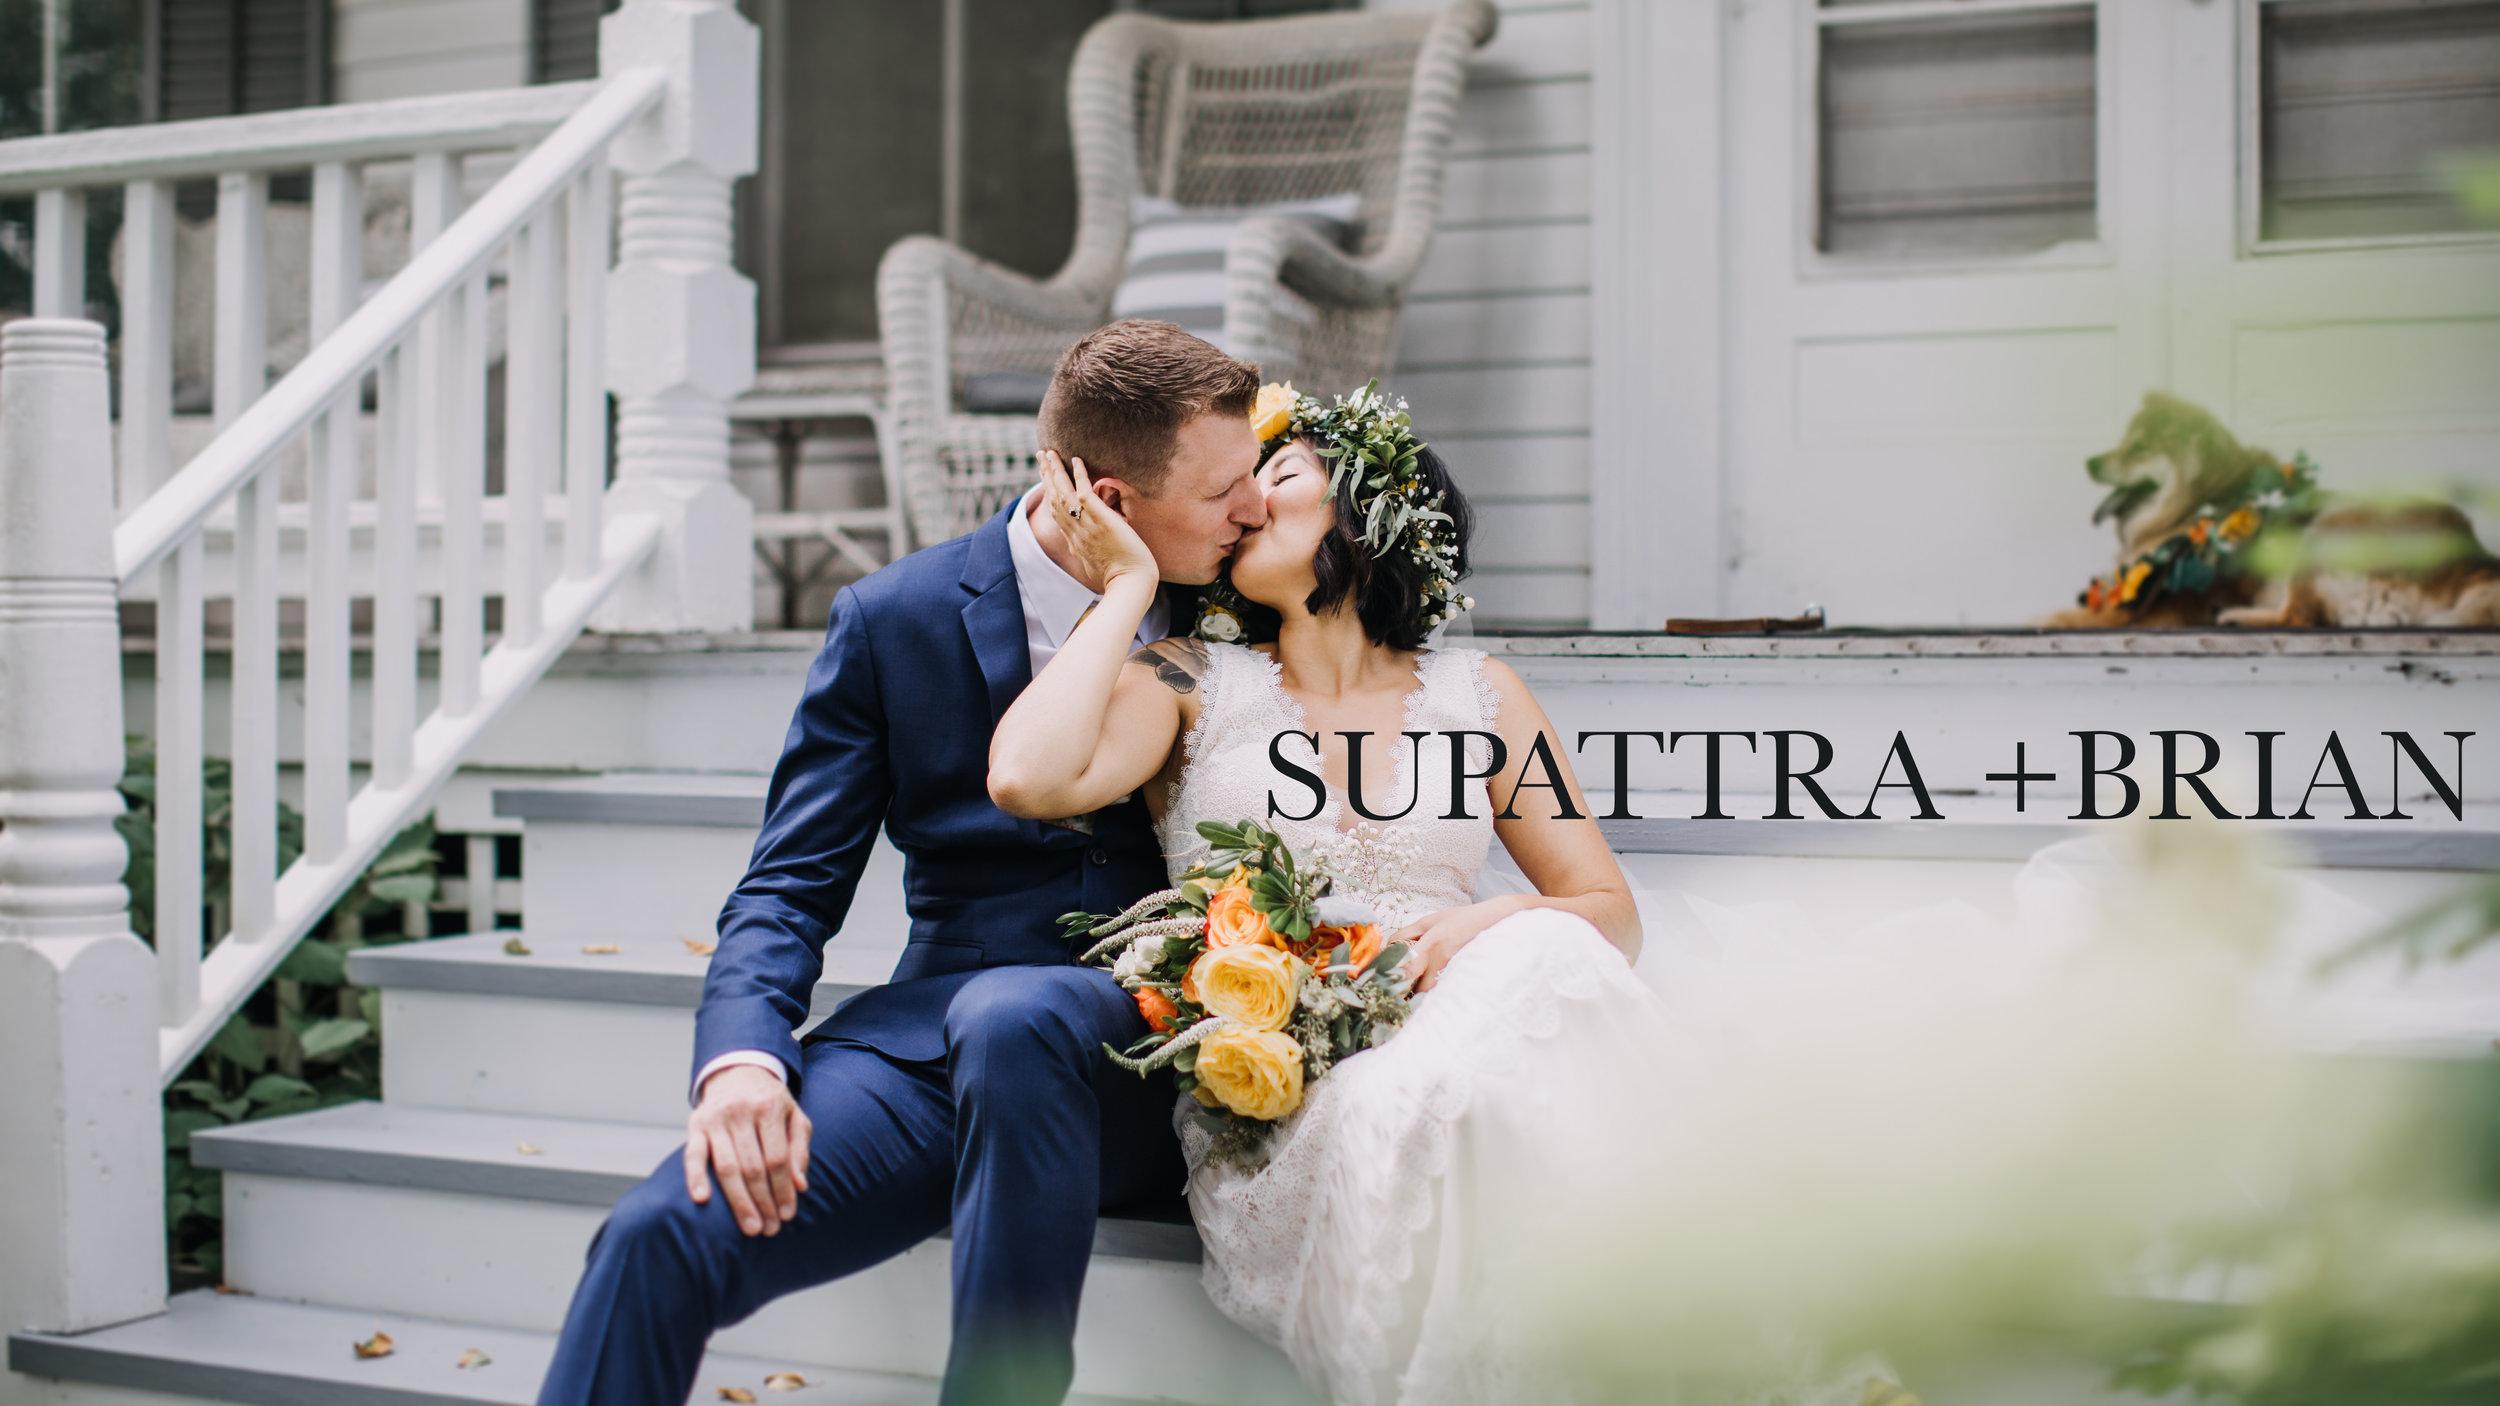 SUPATTRA + BRIAN.jpg